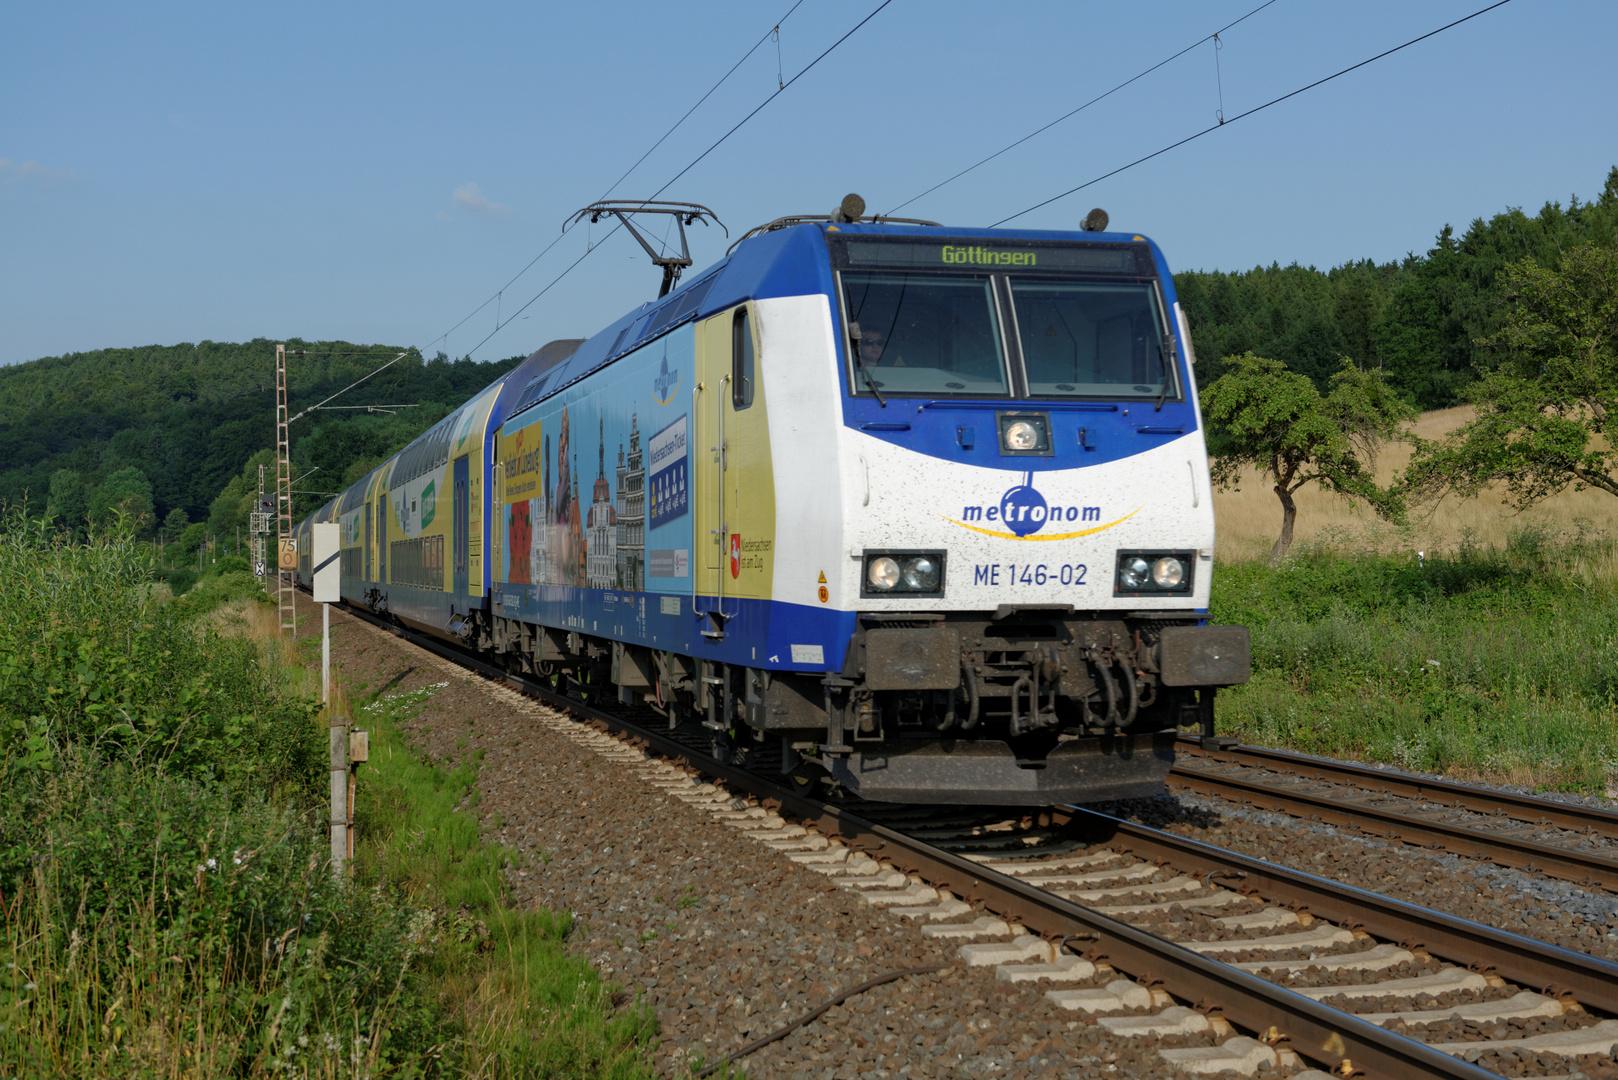 ME 146-02